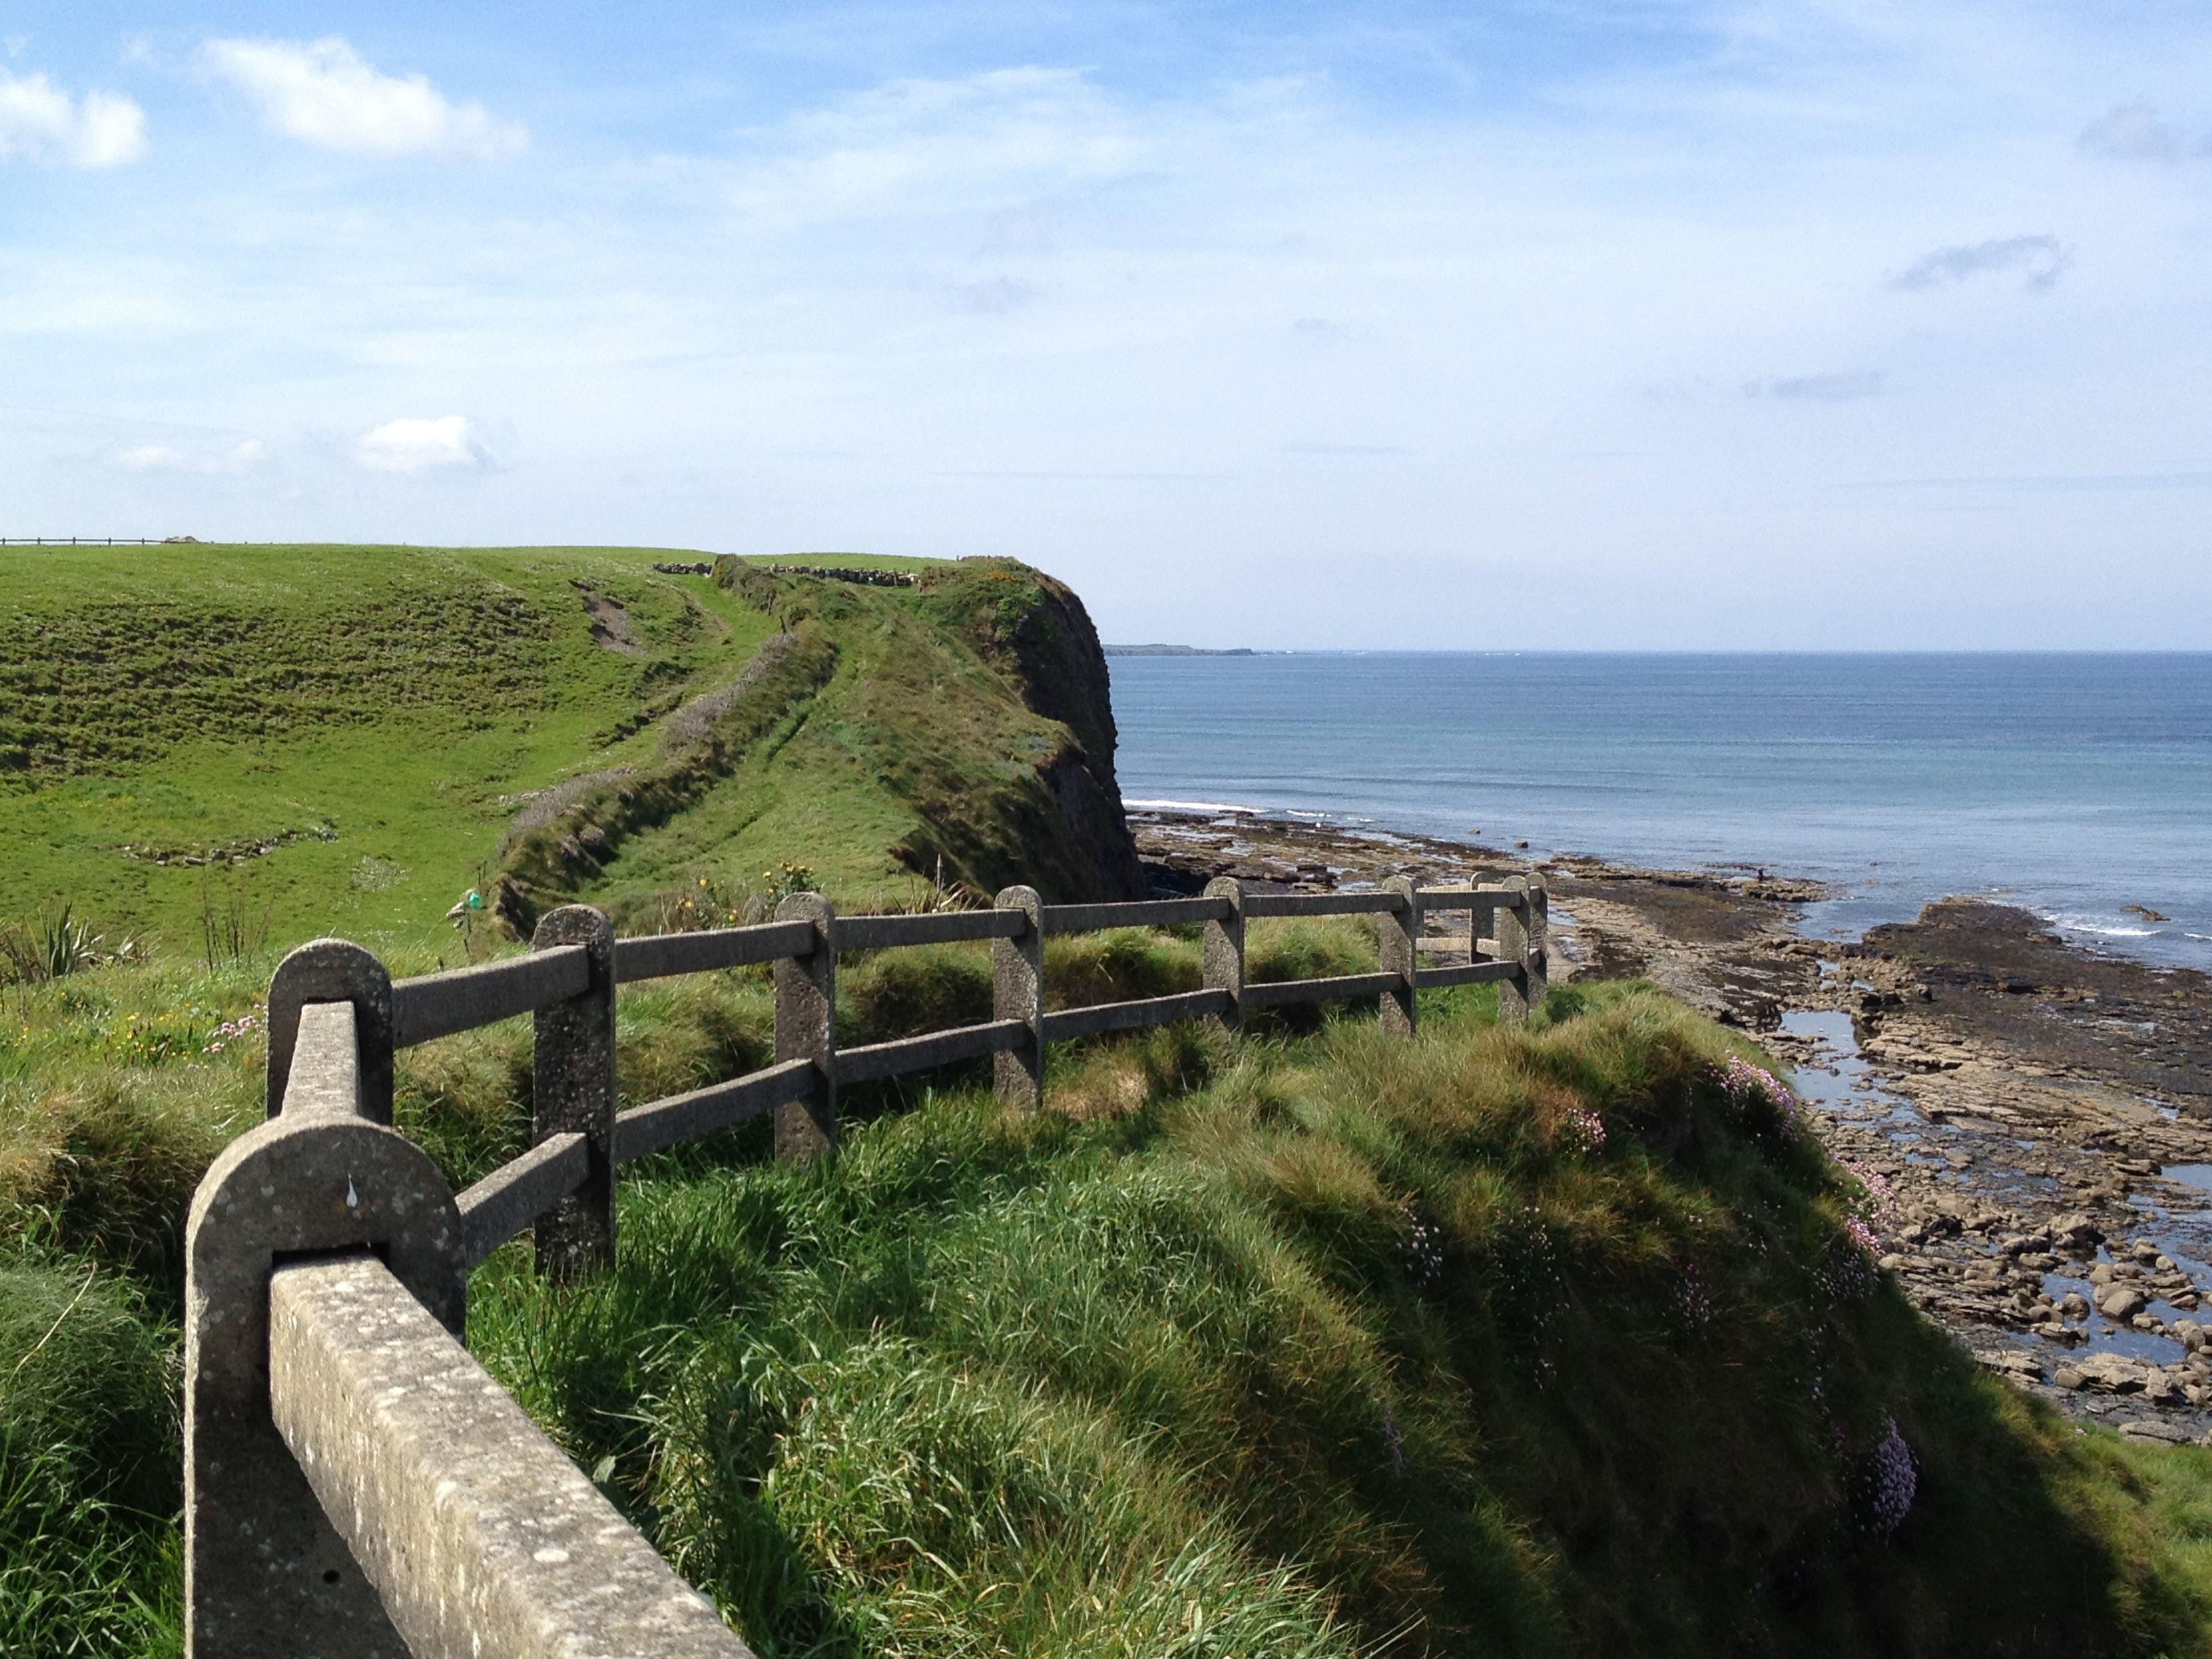 "My latest travel piece: ""Sheep, Stew, and Sea: Three Days in Ireland"" http://newlittlehabitats.wordpress.com/2012/09/23/sheep-stew-and-sea-three-days-in-ireland/ #travel #ireland"